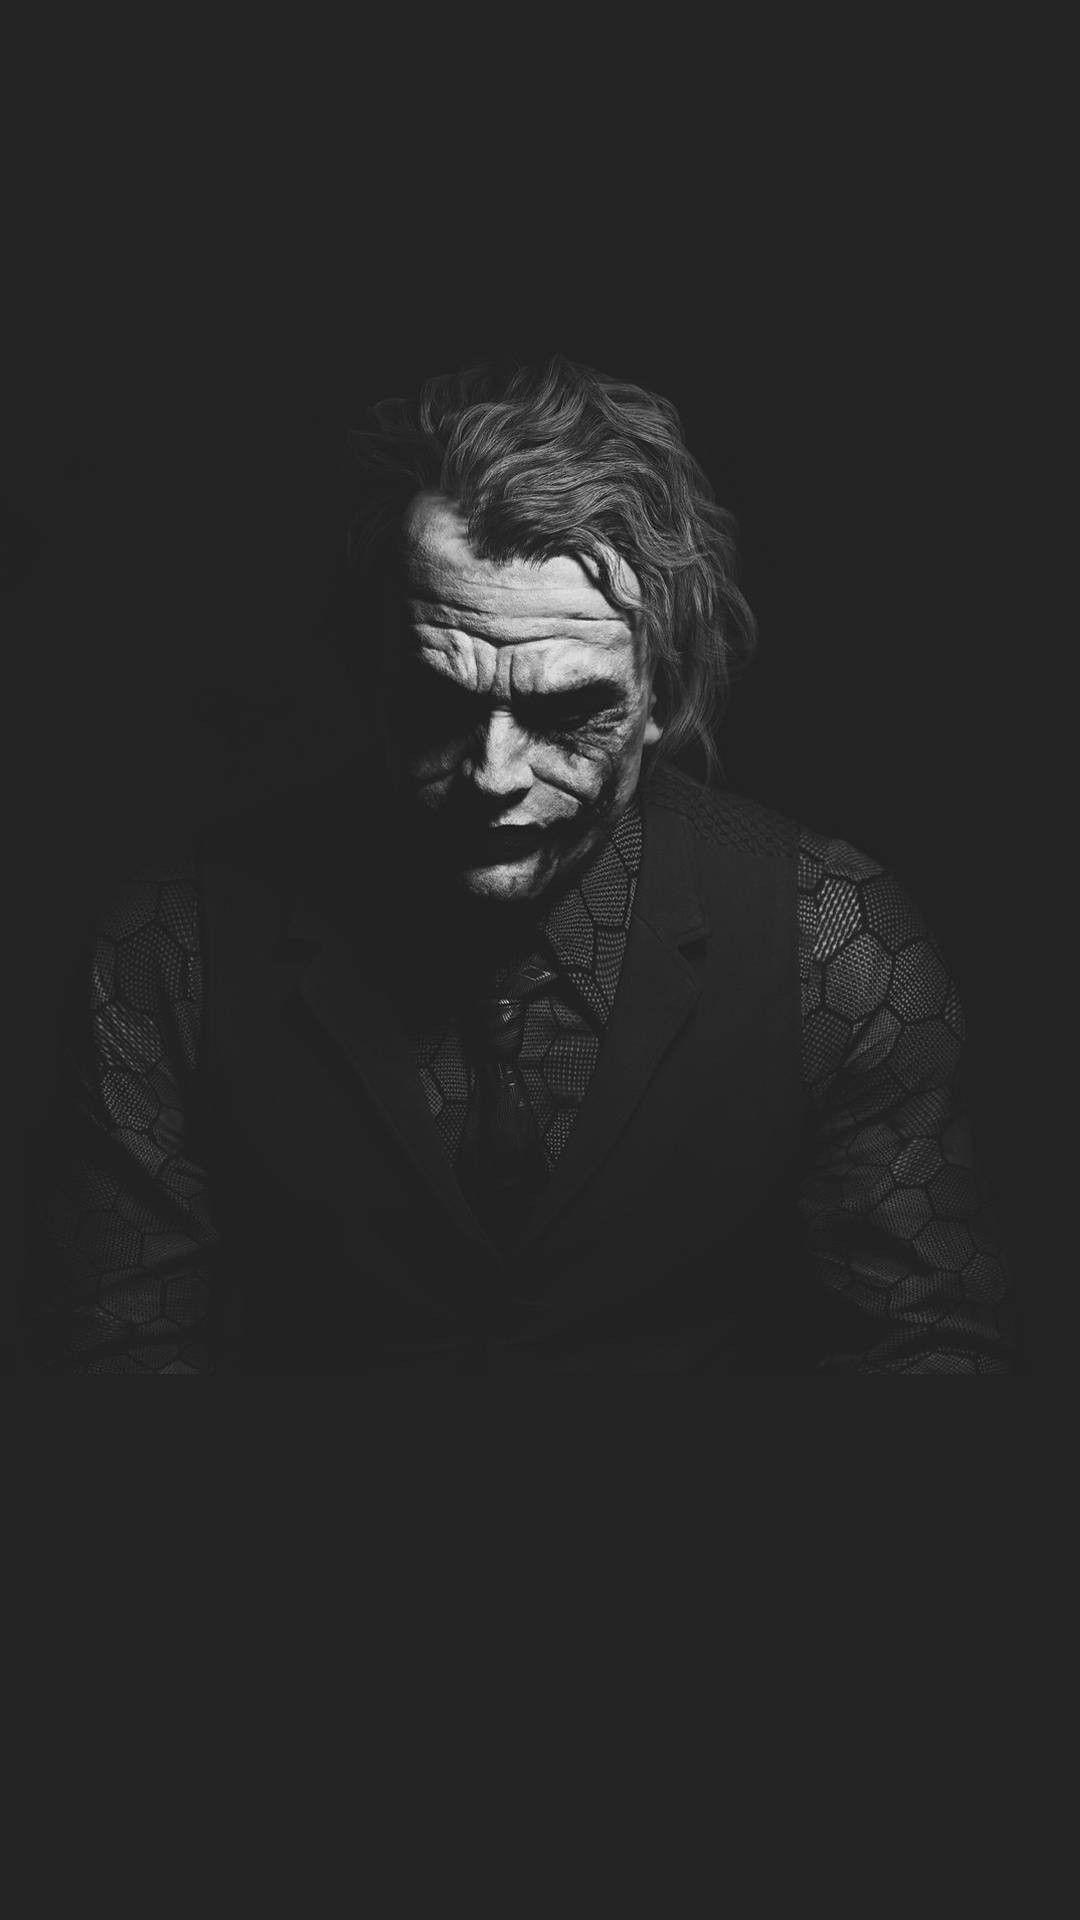 Why So Serious Joker Artwork Joker Wallpapers Joker Heath Joker why so serious iphone wallpaper hd